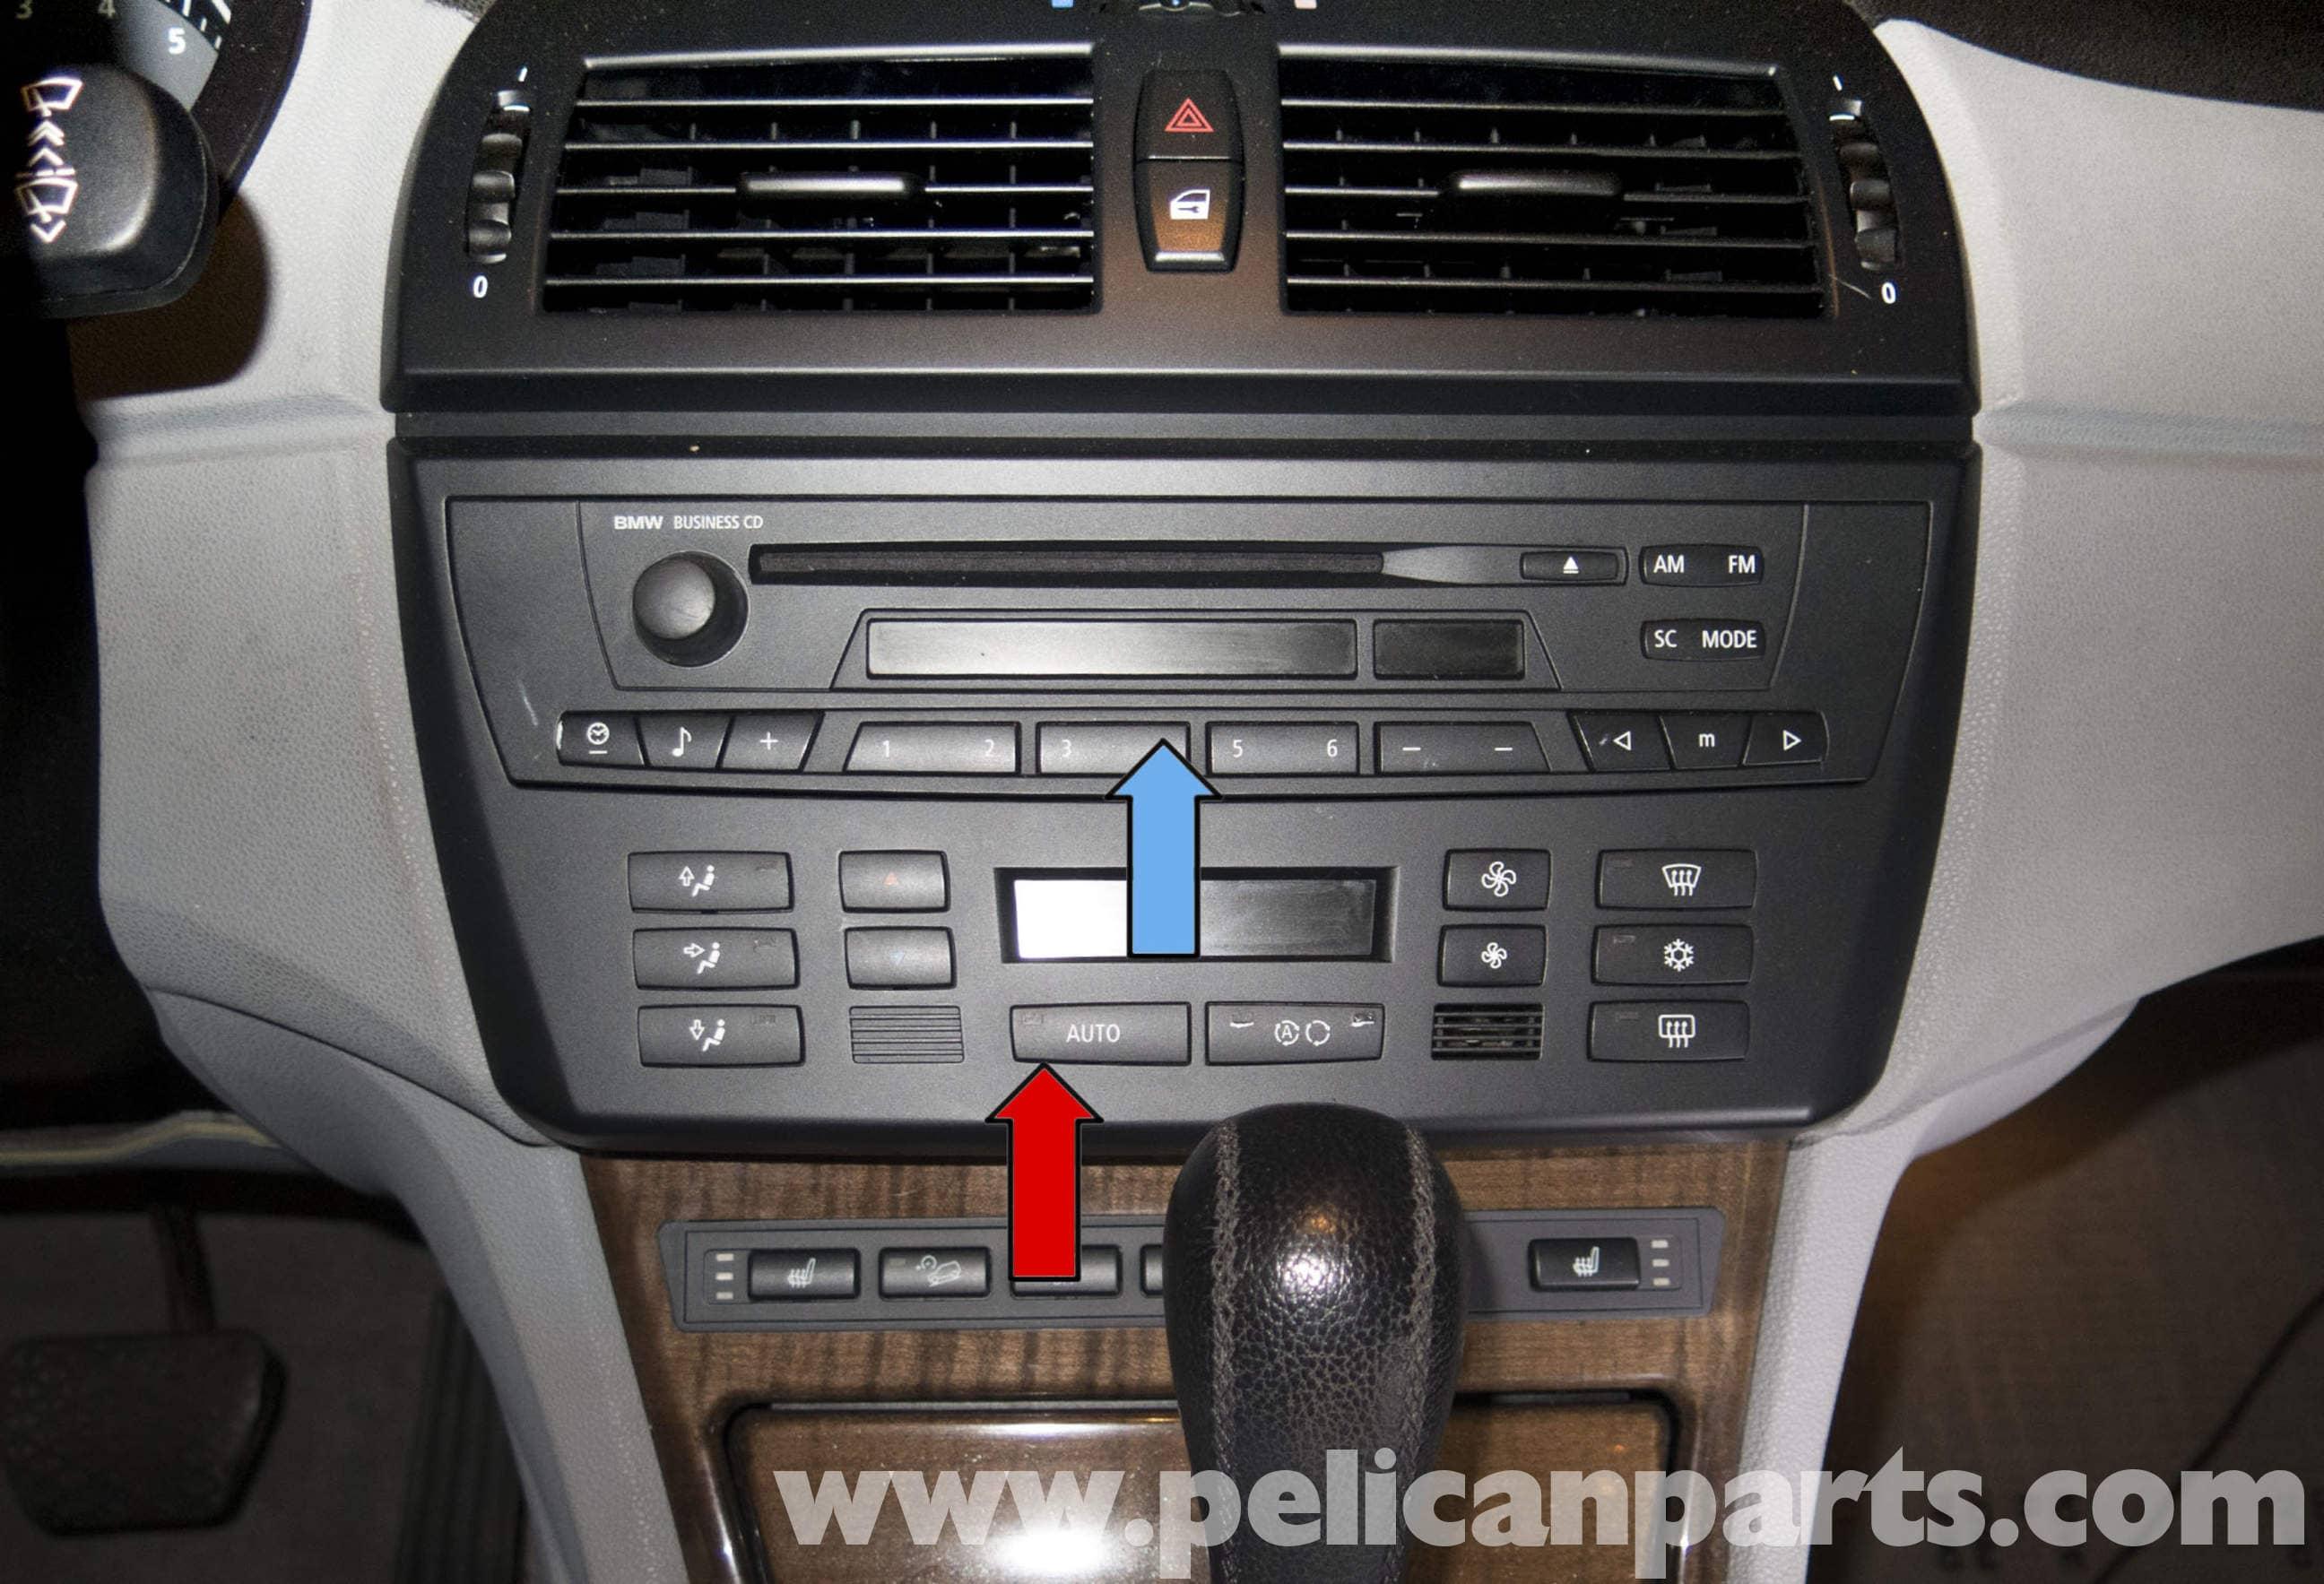 pelican technical article bmw x3 radio ihka panel replacement rh pelicanparts com 2007 bmw x3 radio owners manual 2008 BMW X3